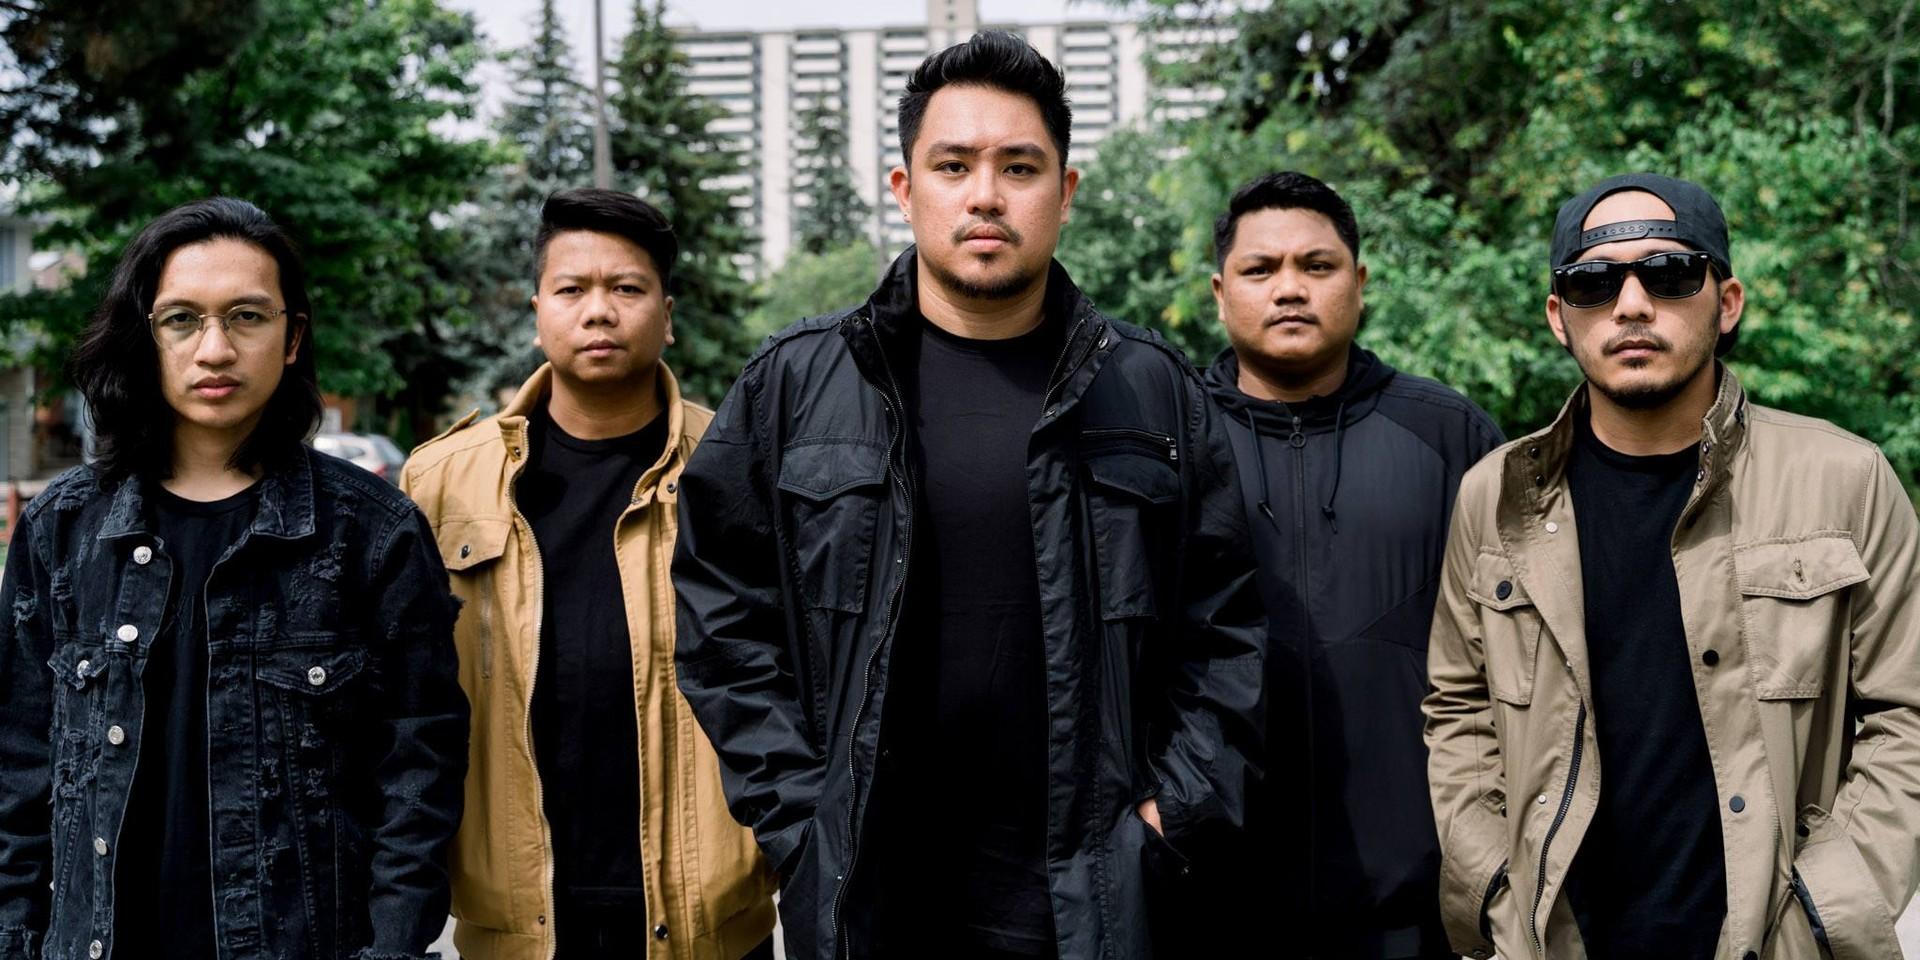 December Avenue release emotional 'Huling Sandali' music video – watch